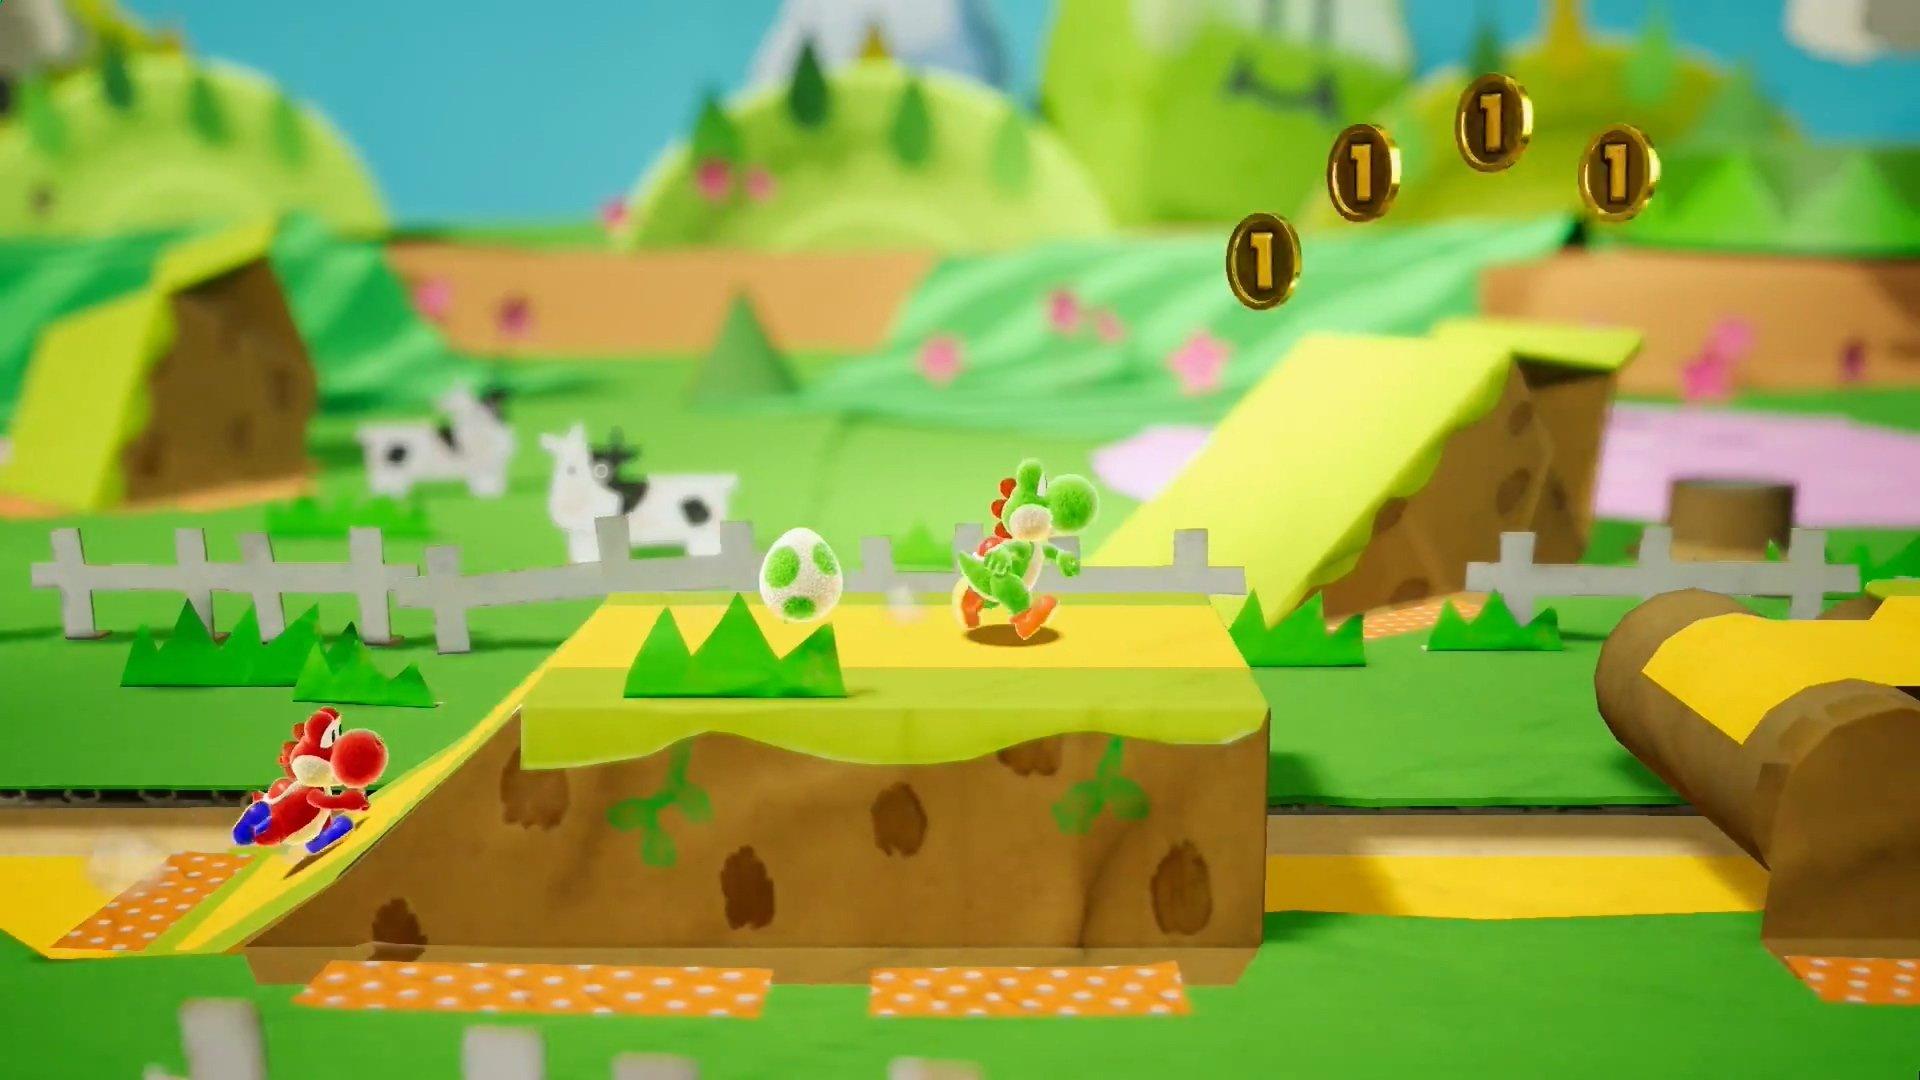 Yoshi pour Nintendo retardé jusqu'en 2019